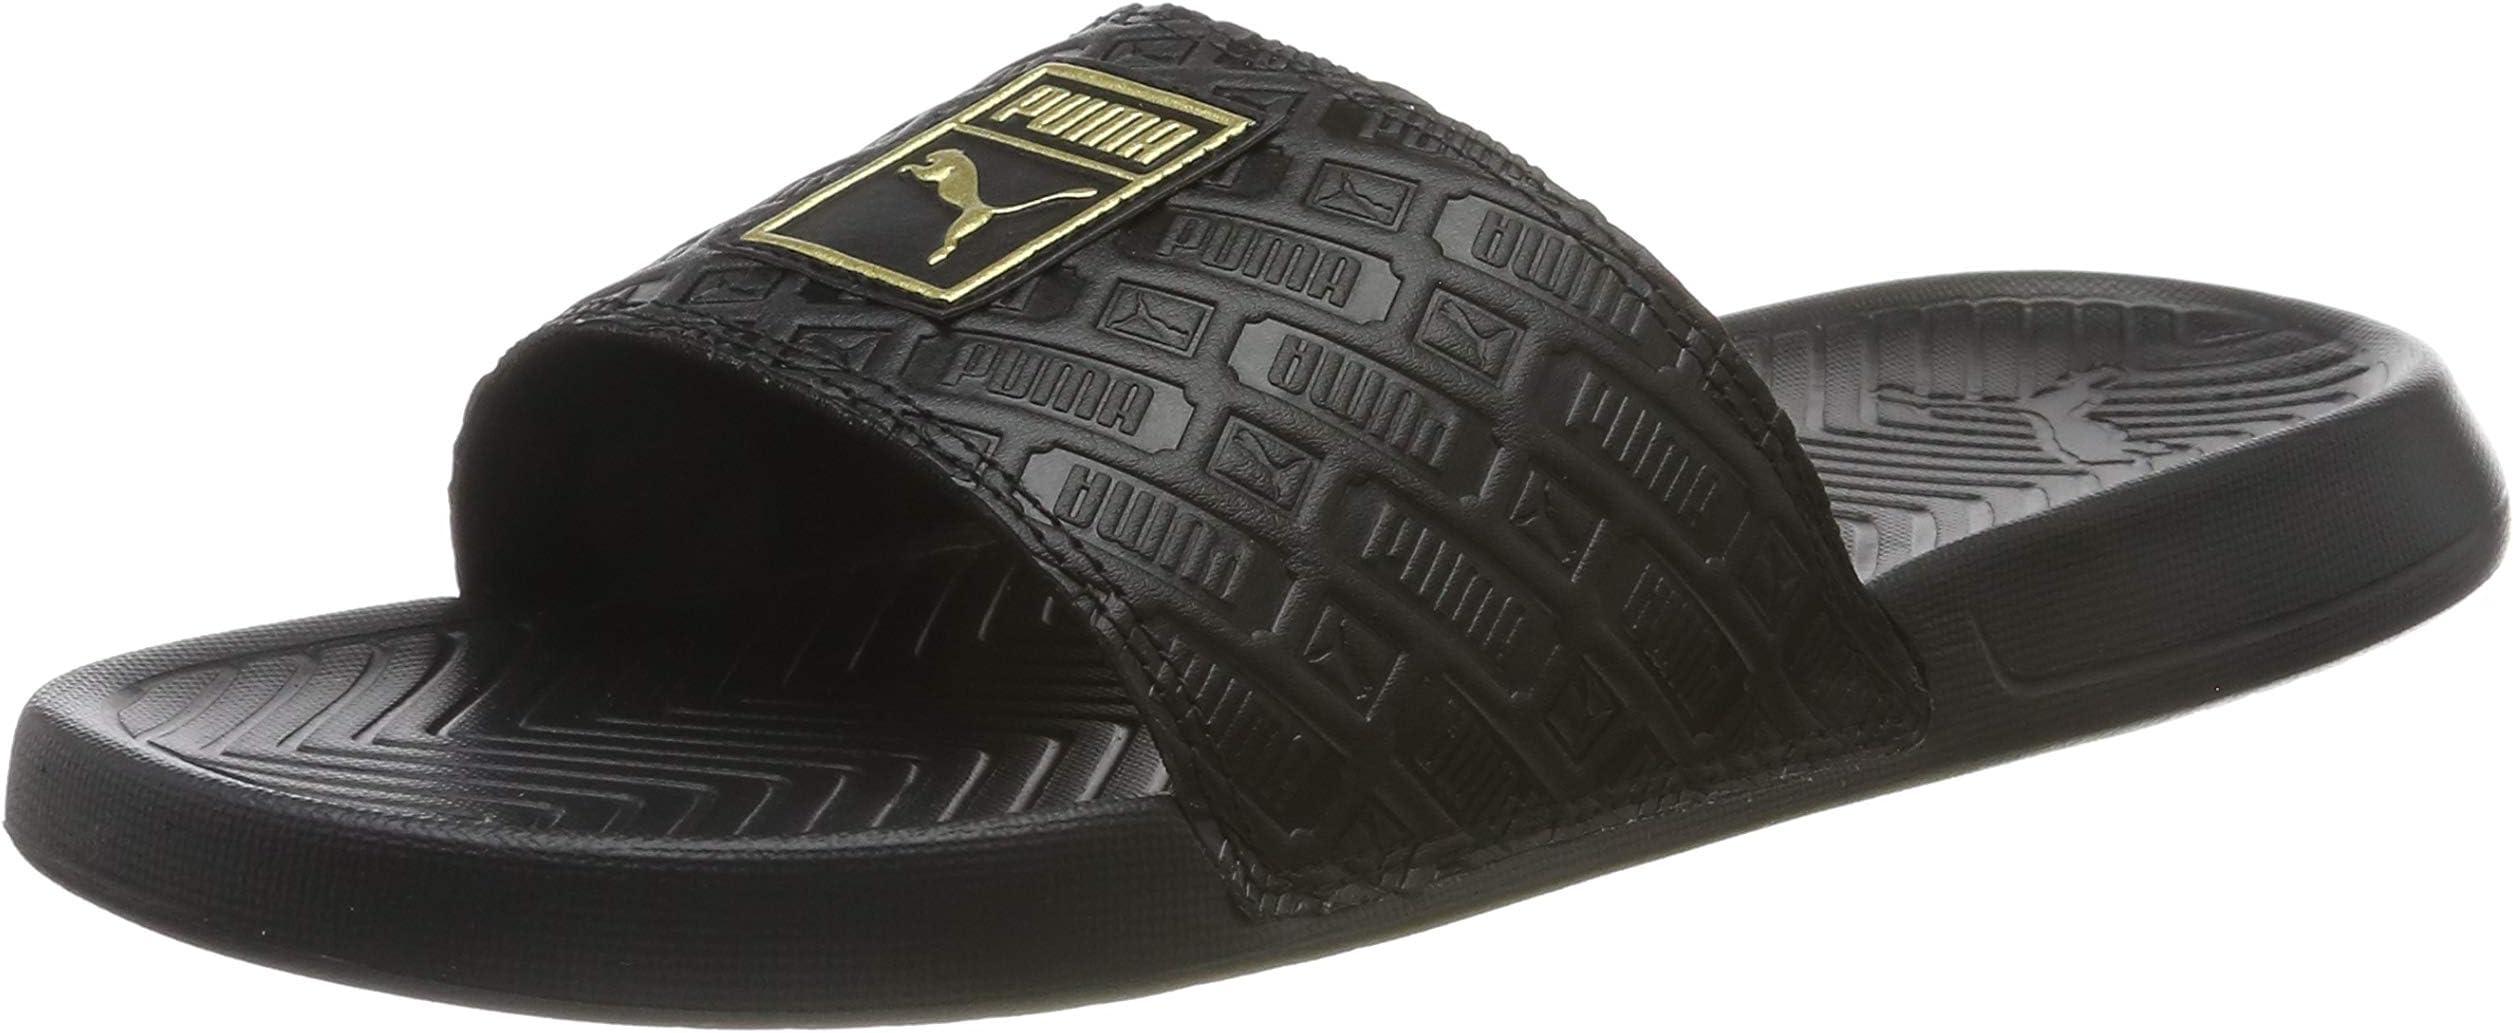 puma slippers uk